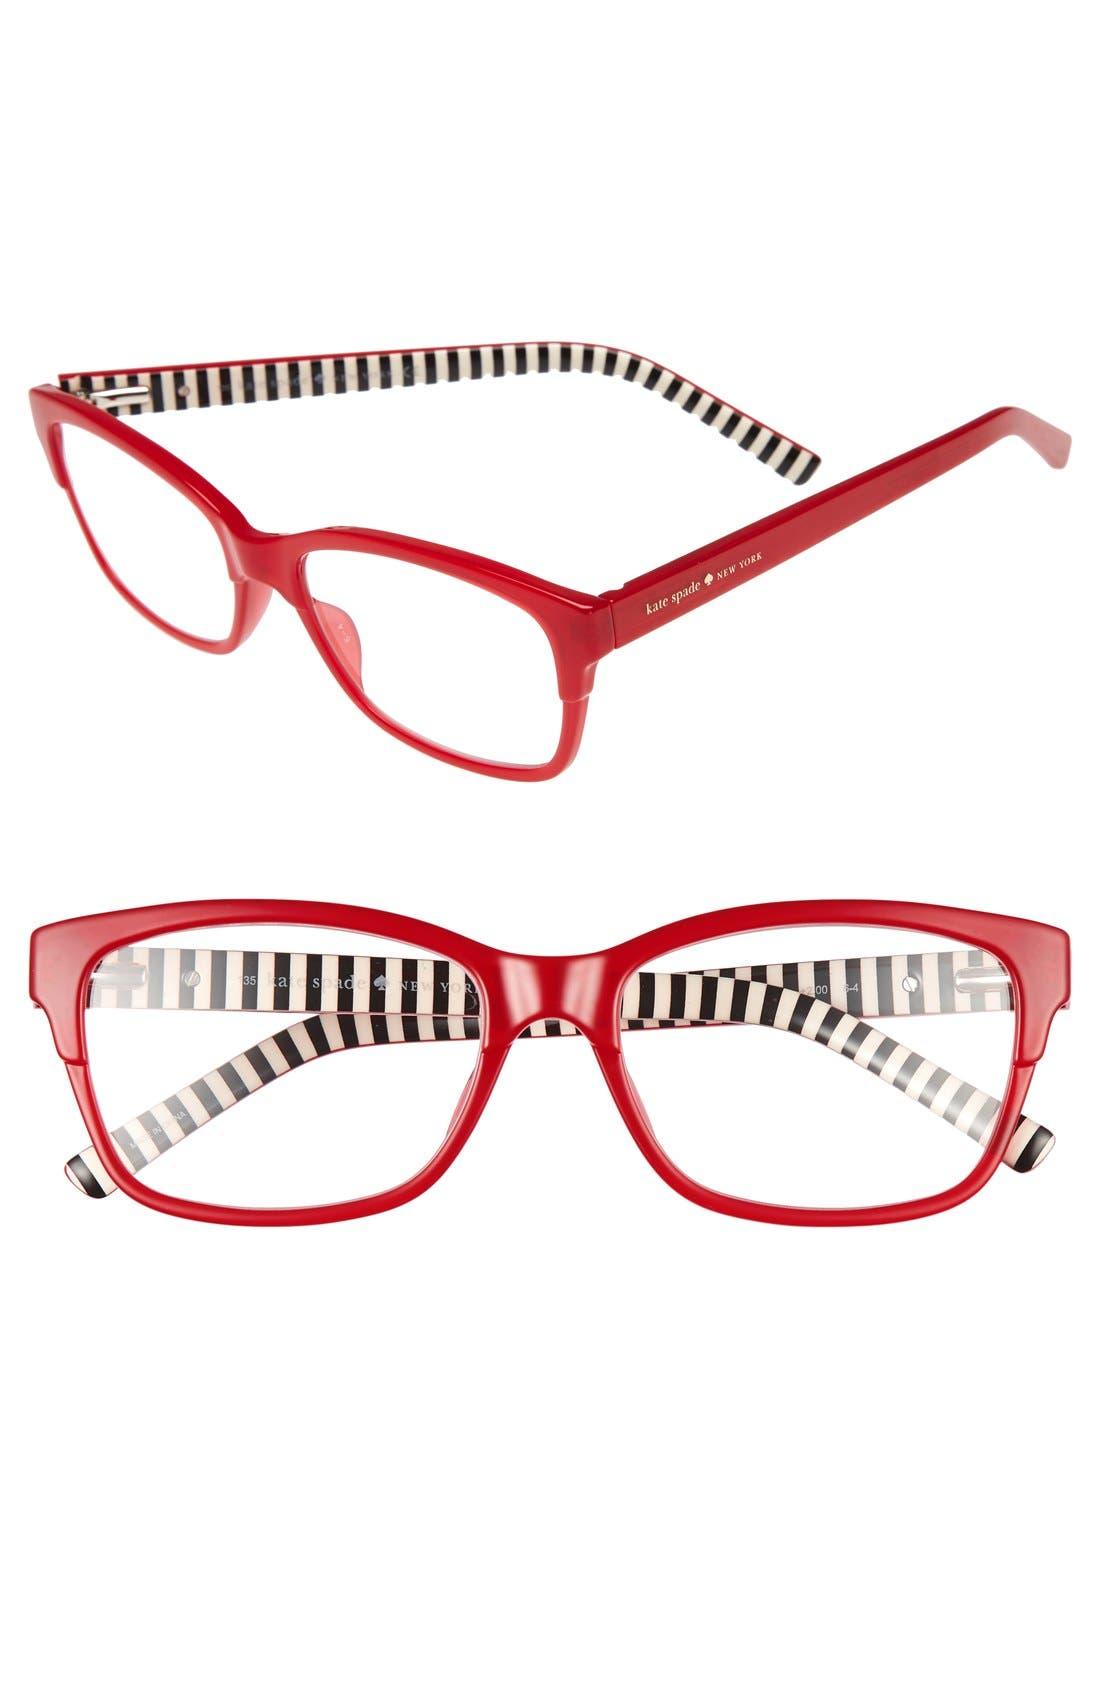 Tenil 52Mm Reading Glasses - Milky Red